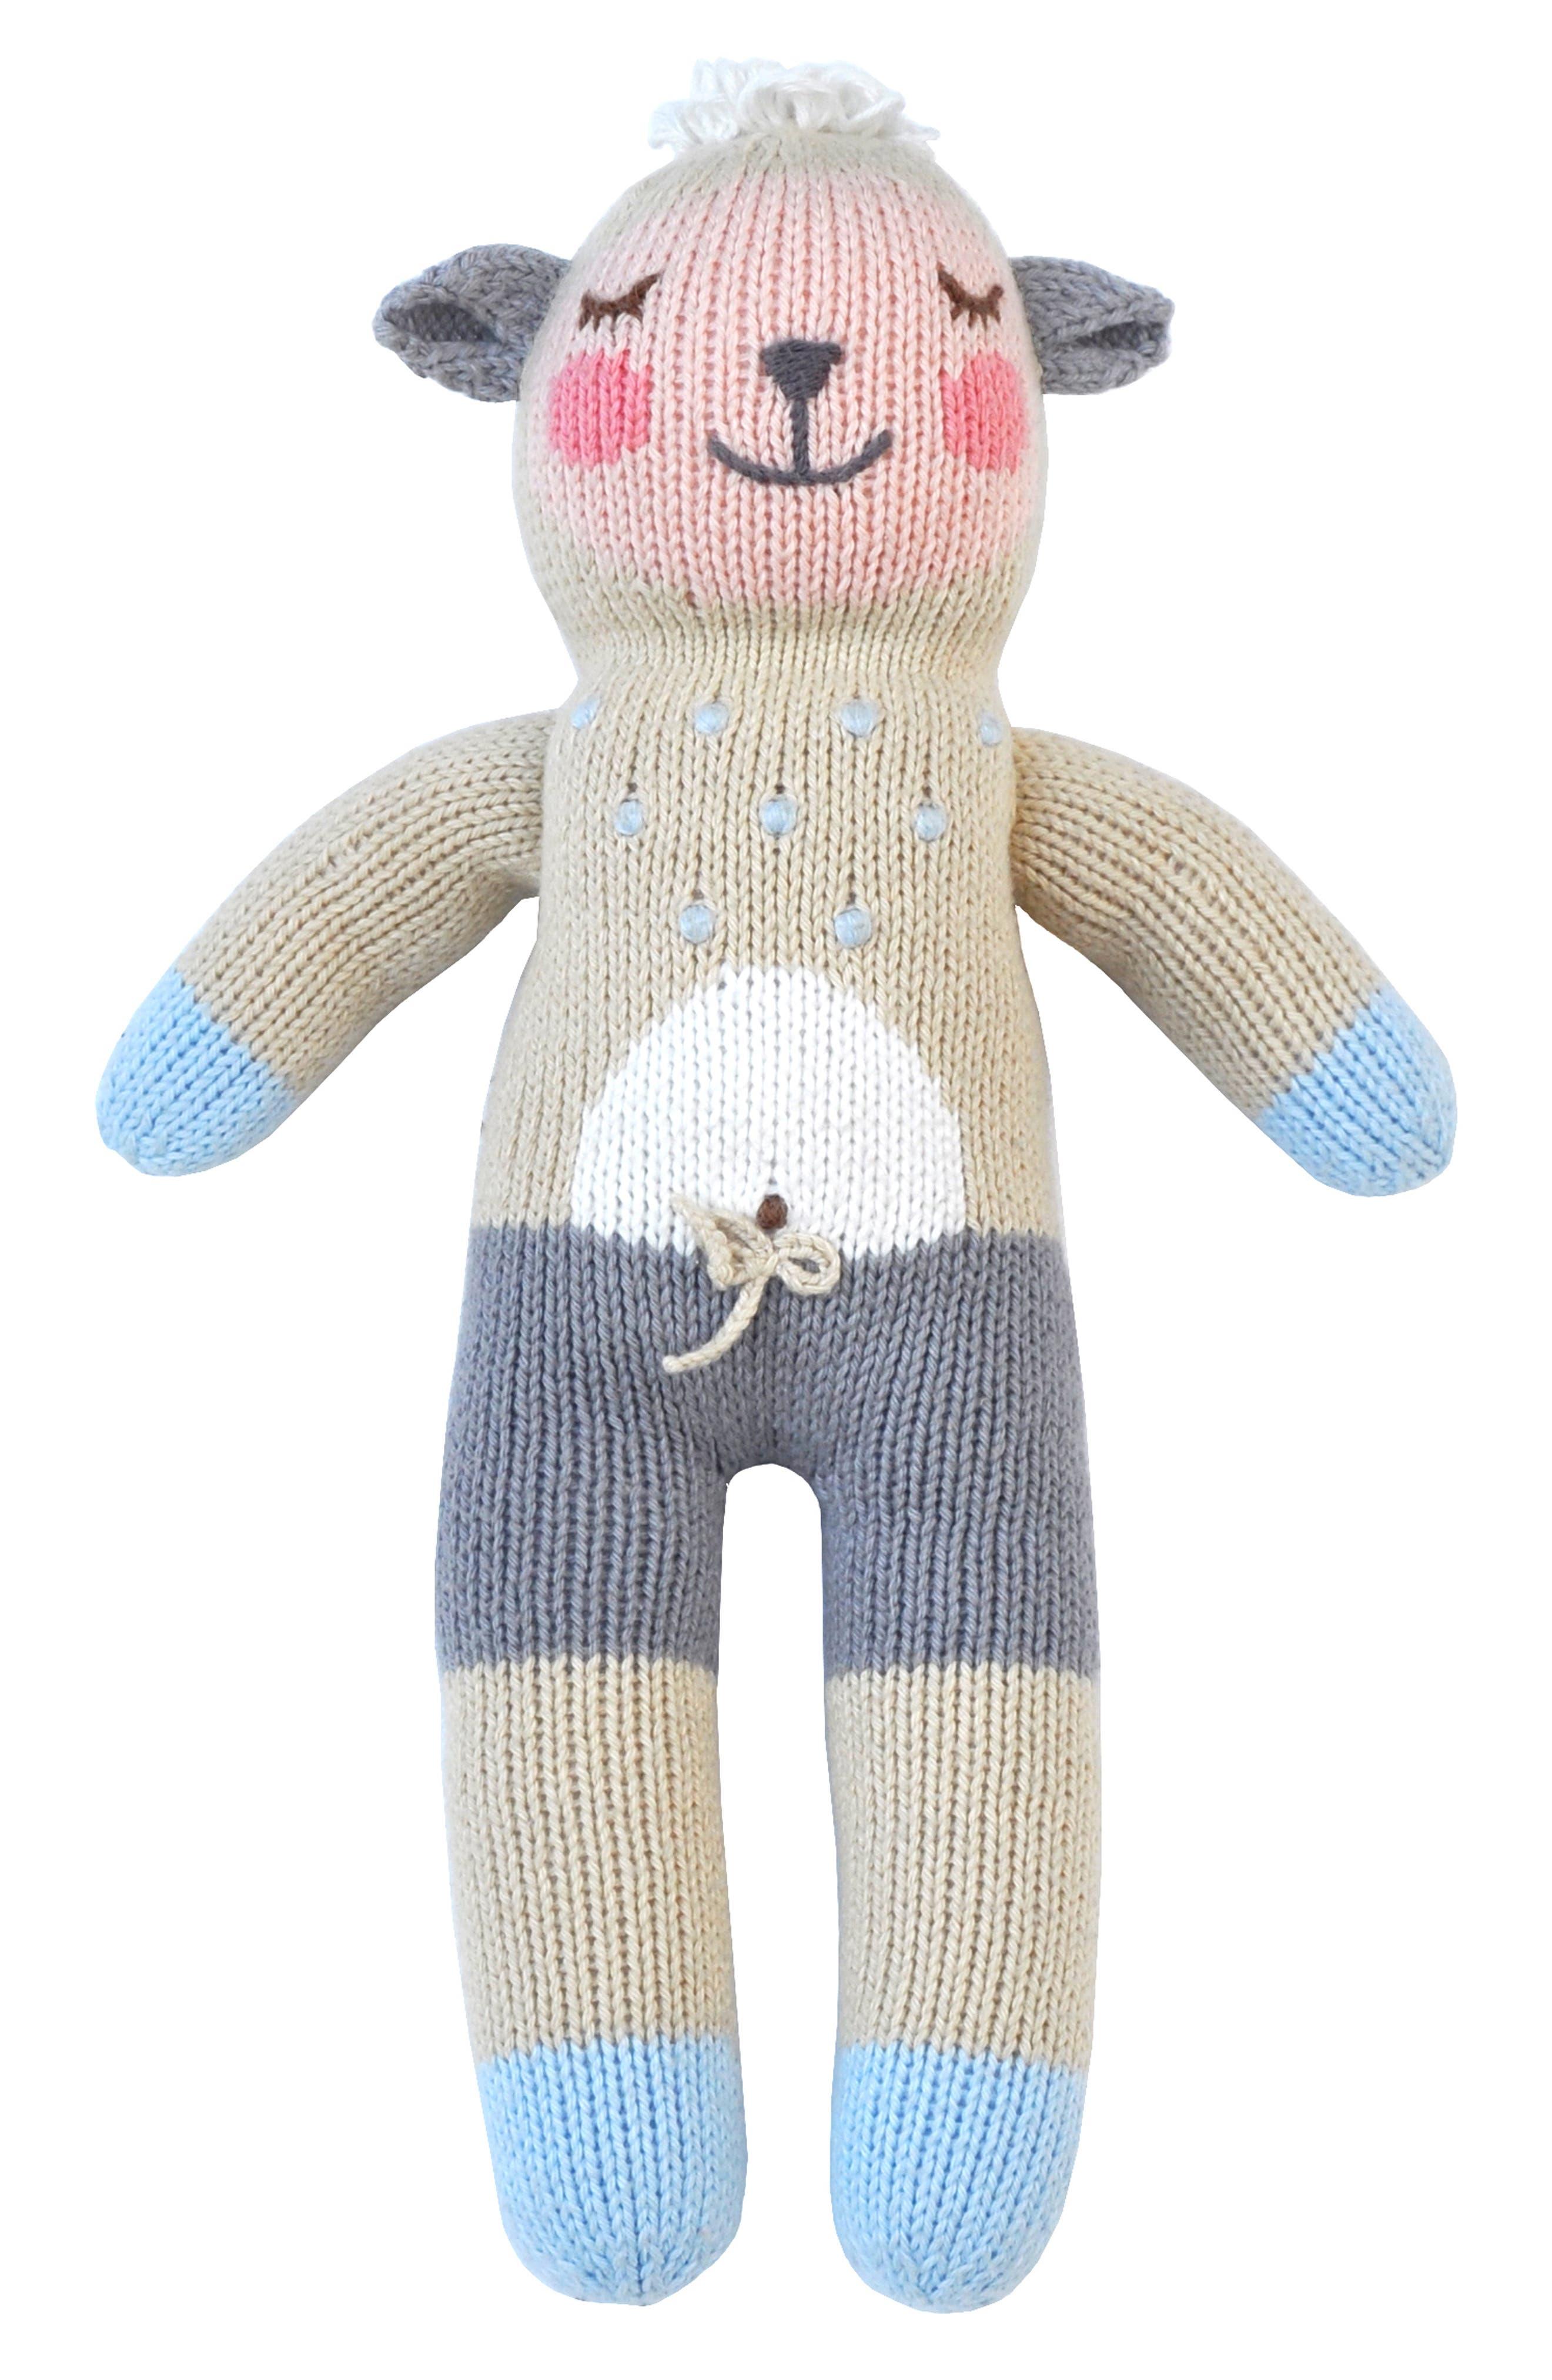 Blabla Woolly The Sheep Hand Knit Doll